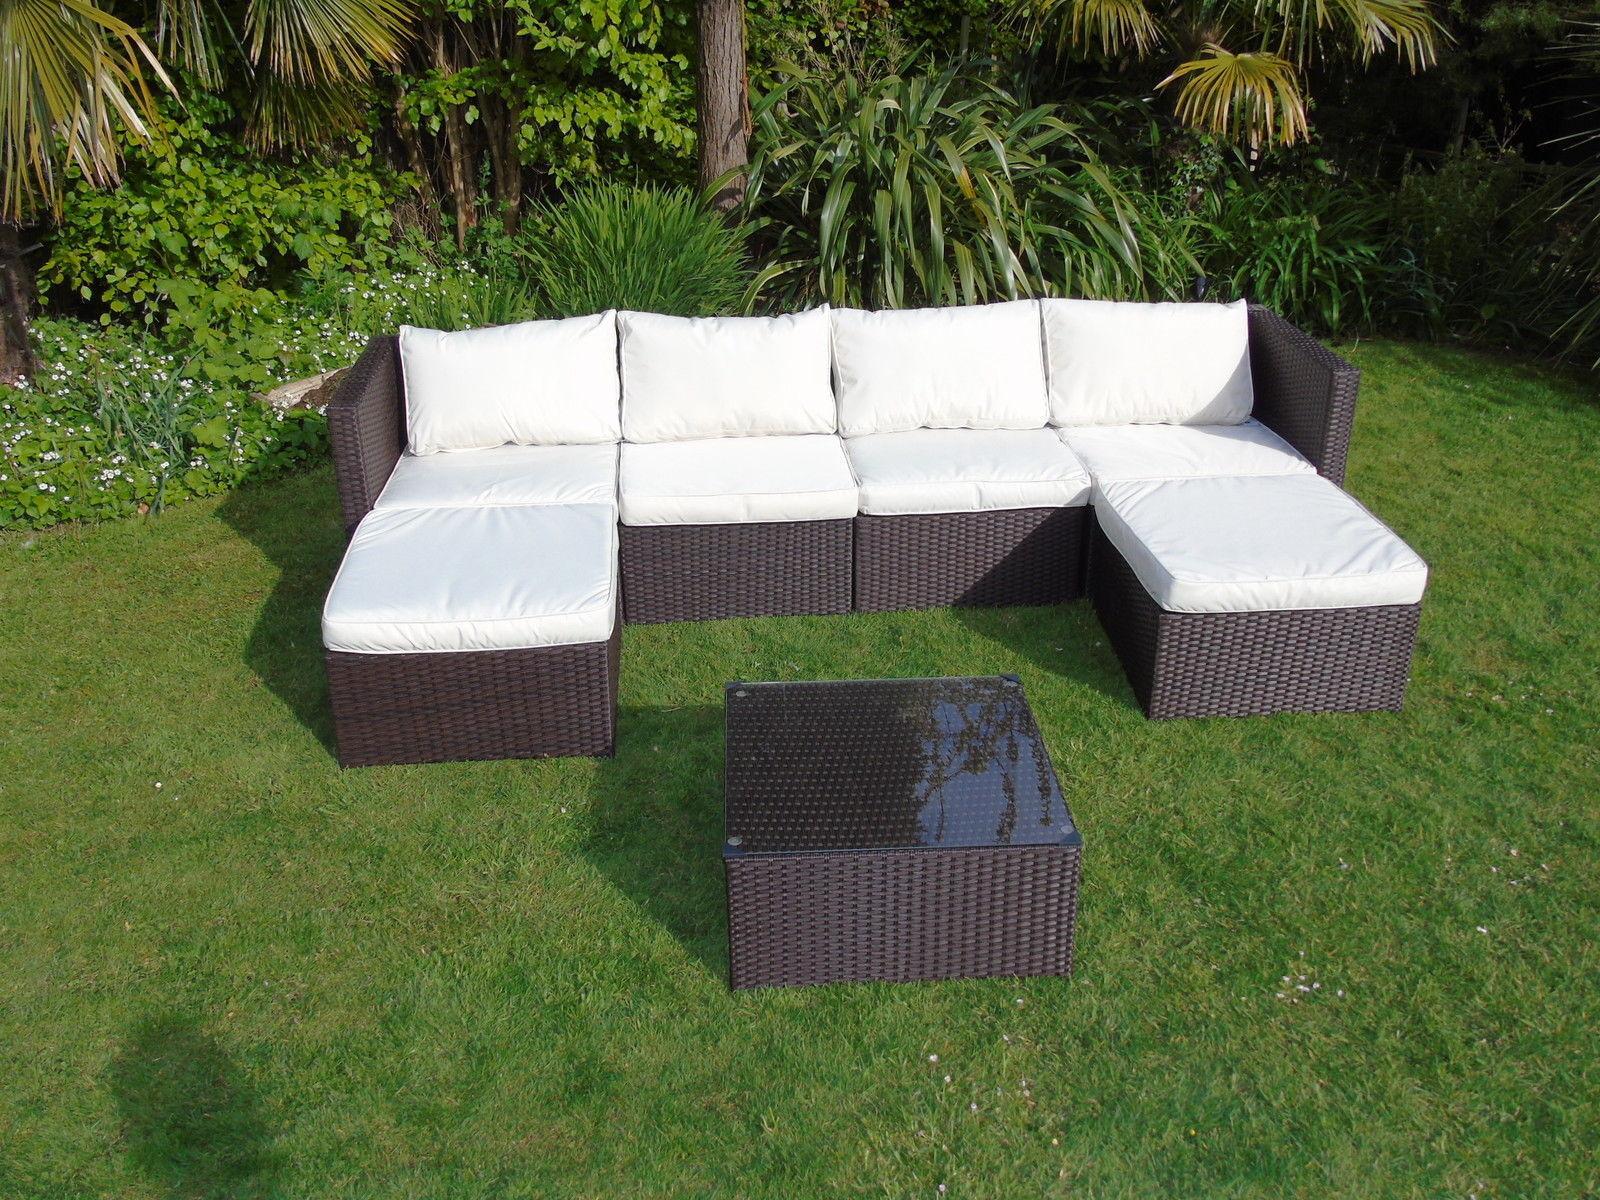 rattan garden corner sofas uk baxter sofa chester moon new wicker conservatory outdoor furniture